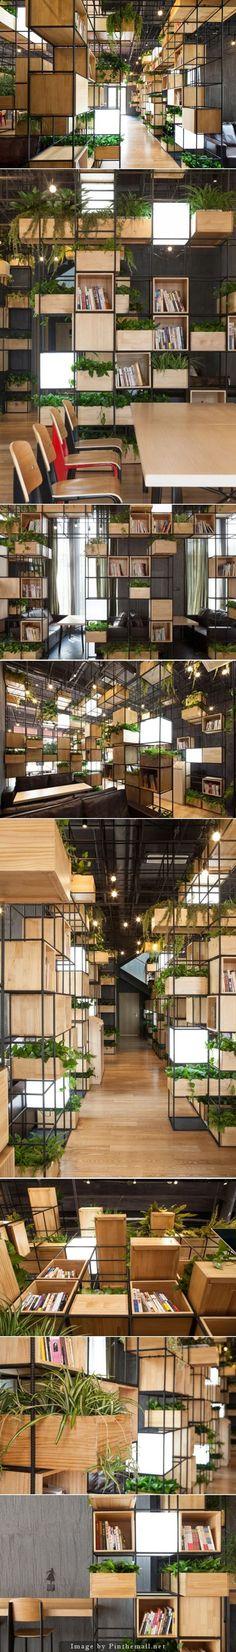 PENDA - Modular shelves & planters - Wooden box shelves and planters and light cubes populate a gridded metal framework: